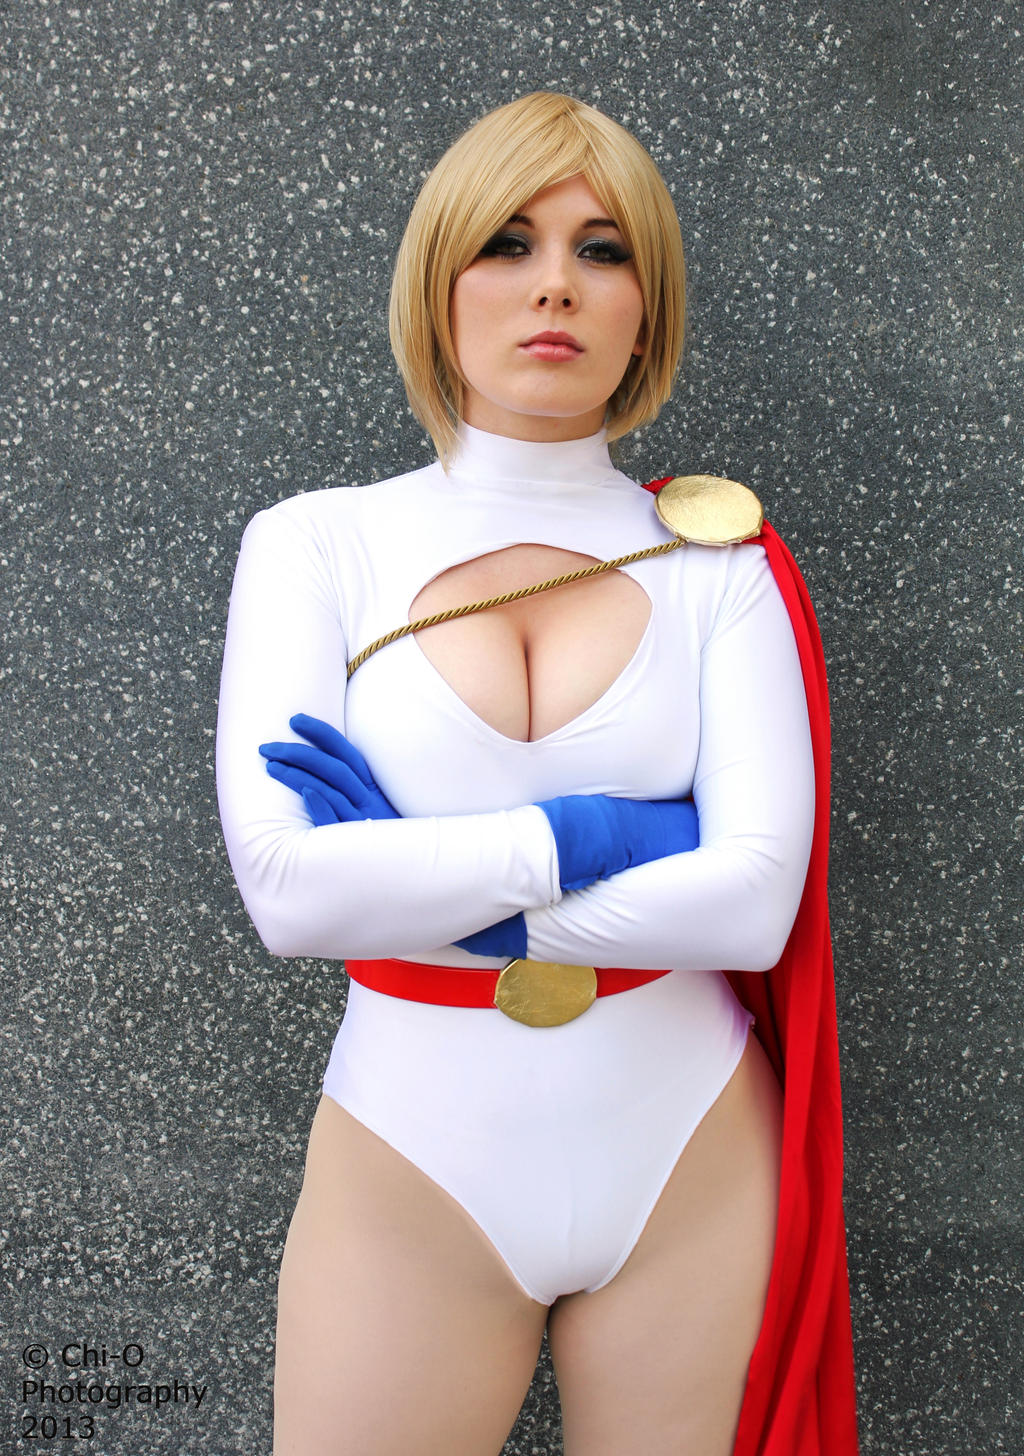 Power Girl by GraceyDarling